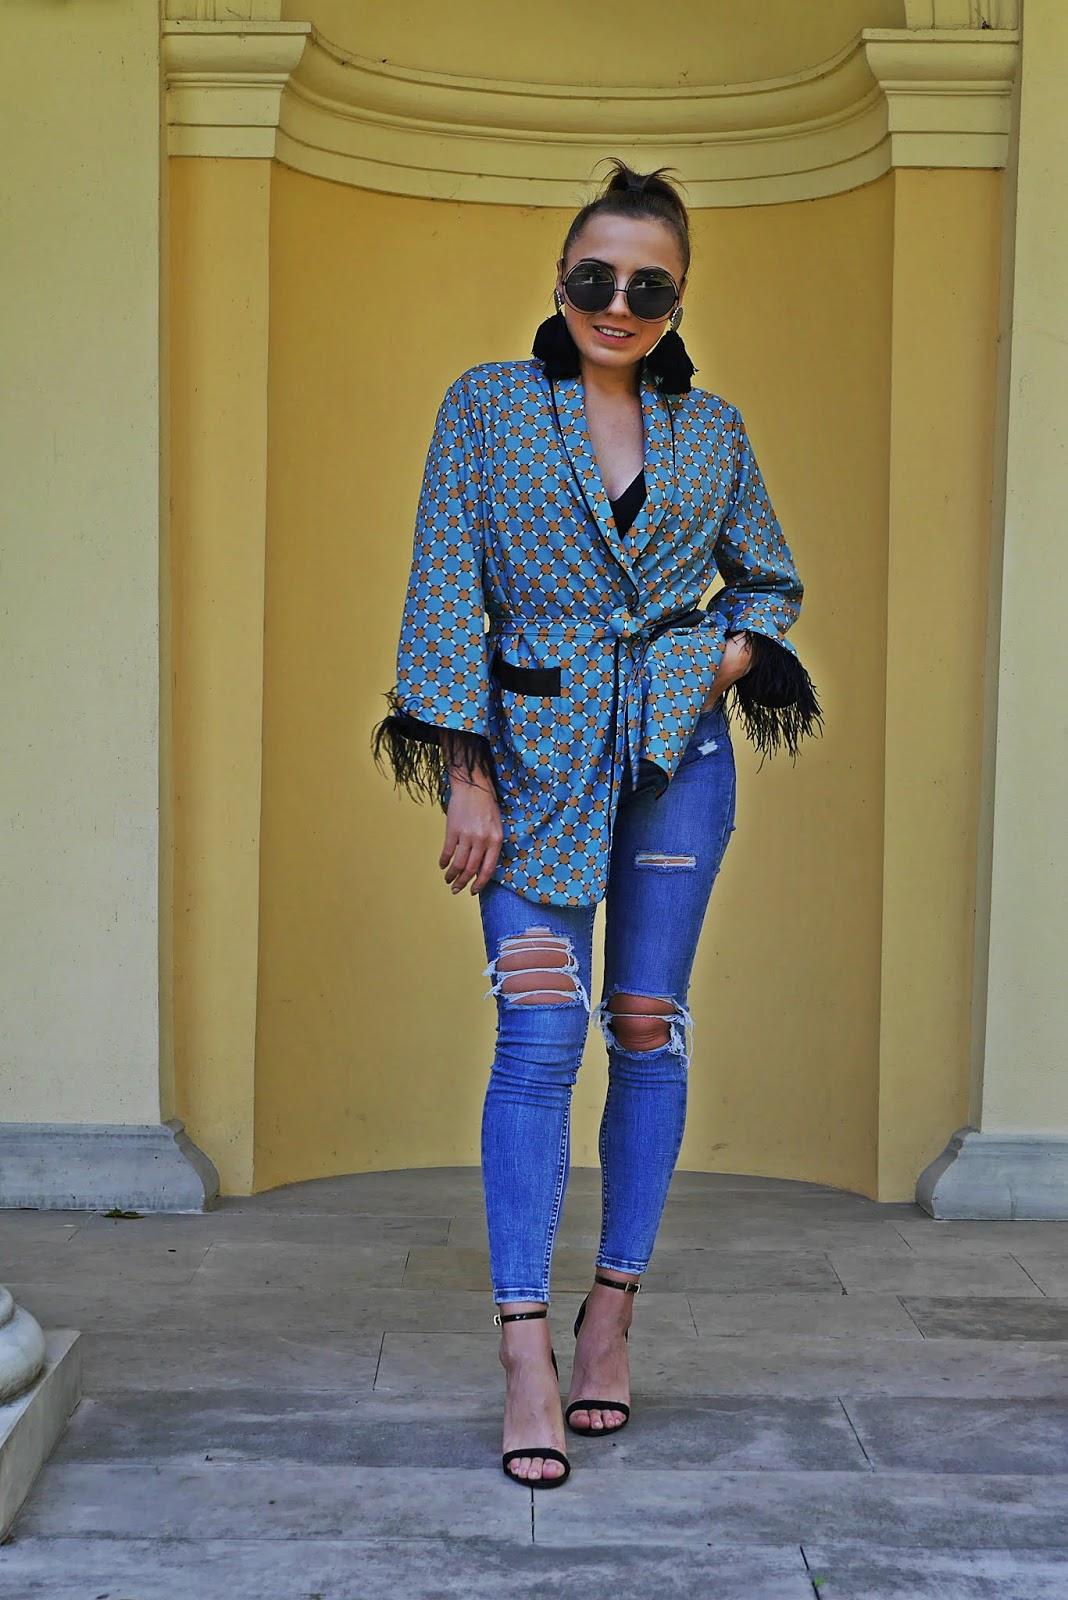 shein pattern kimono denim pants high heels black sunglasses karyn blog modowy